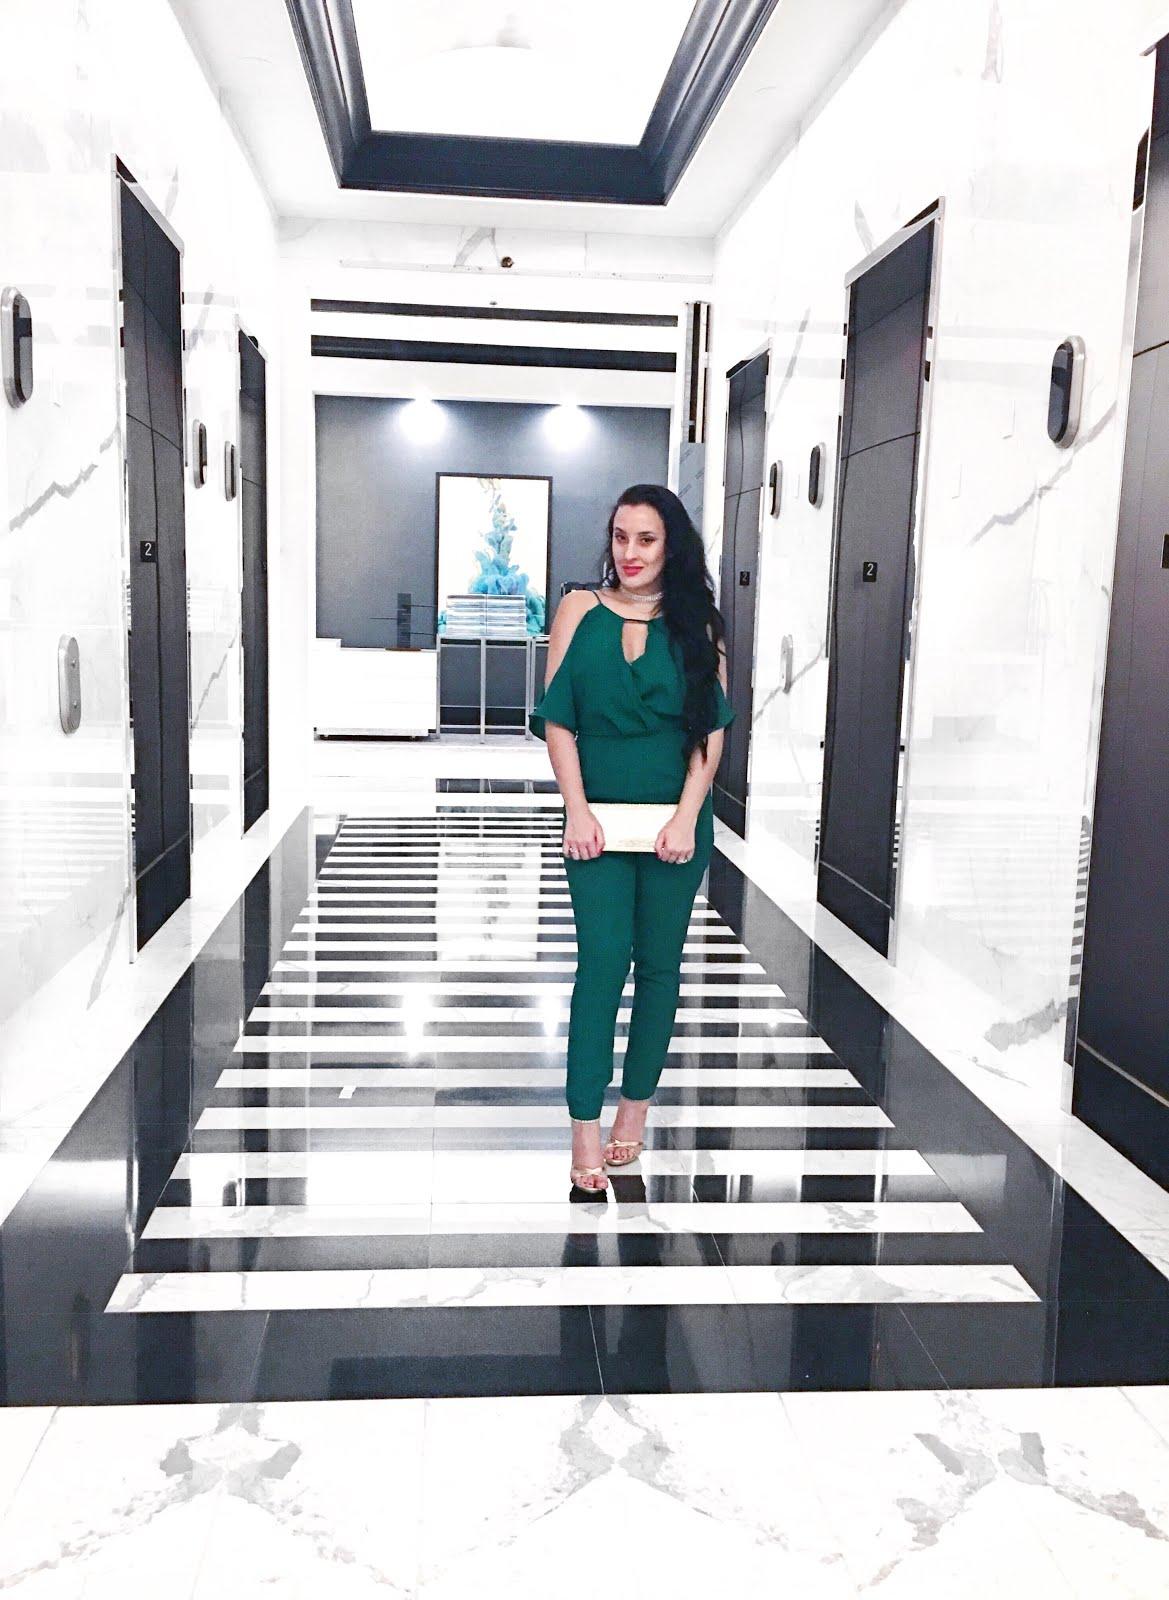 Emerald-Jumper-OOTD-Miami-Fl-Vivi-Brizuela-PinkOrchidMakeup